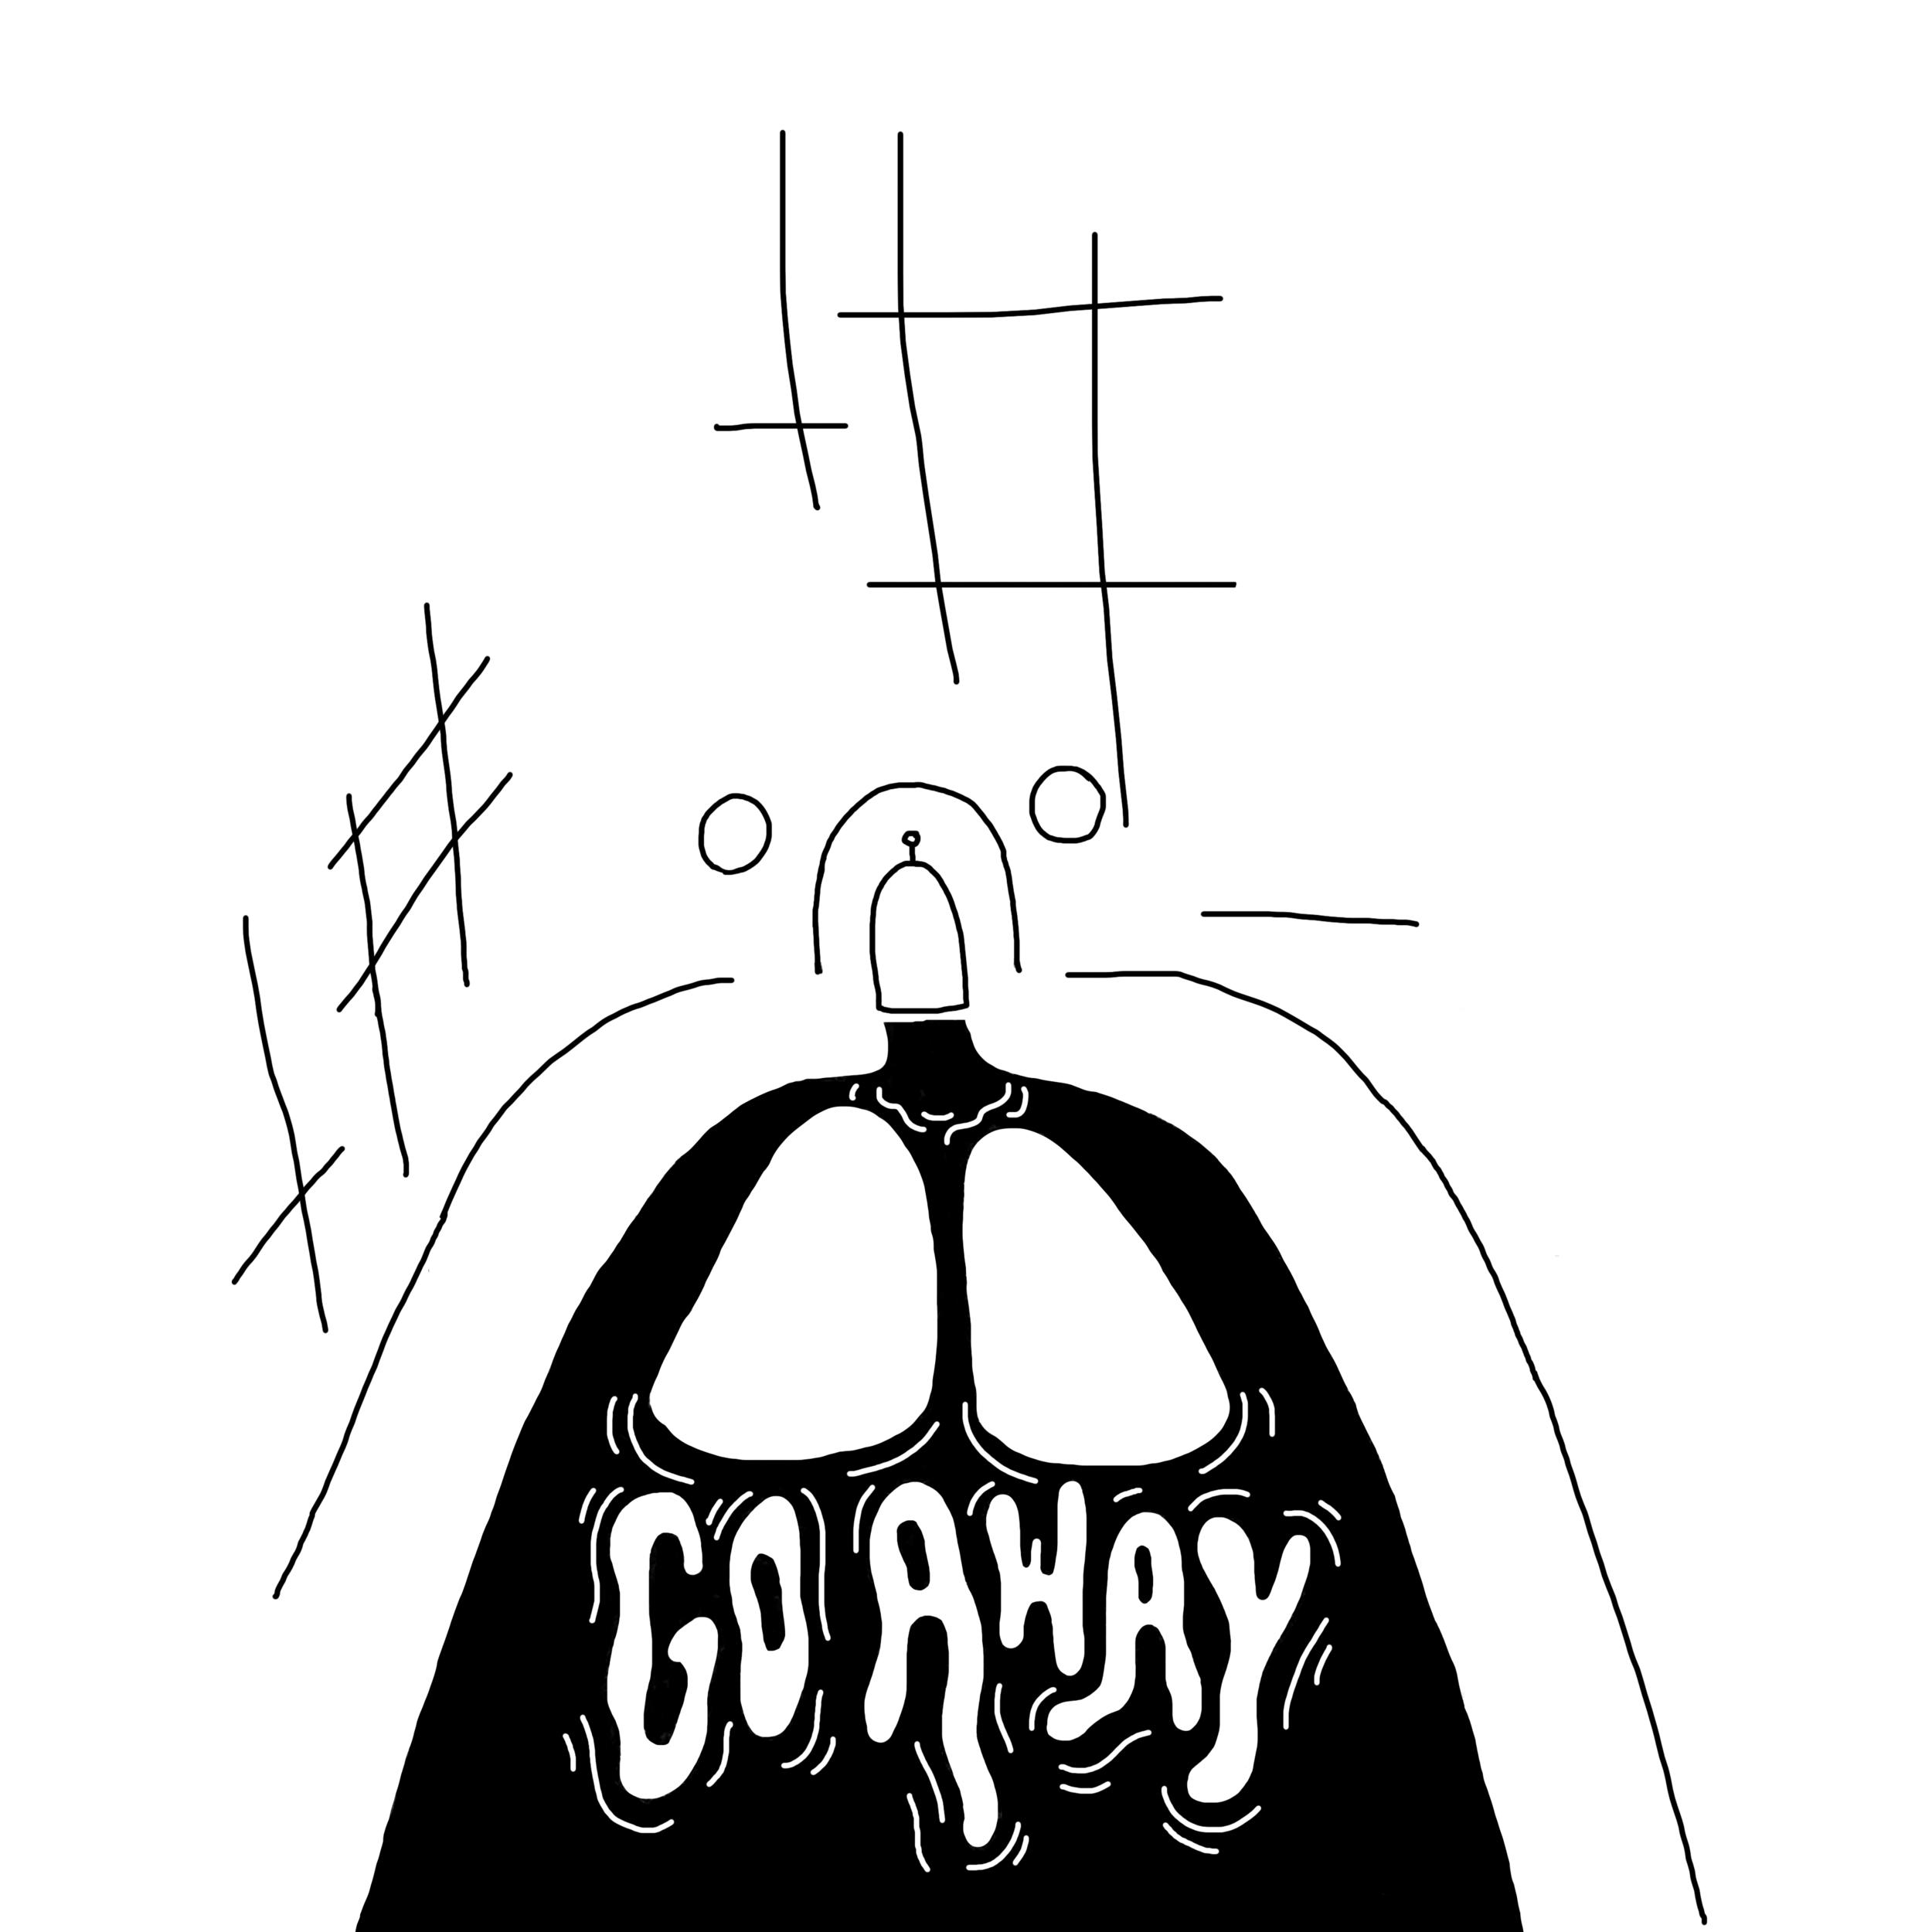 goaway2.png